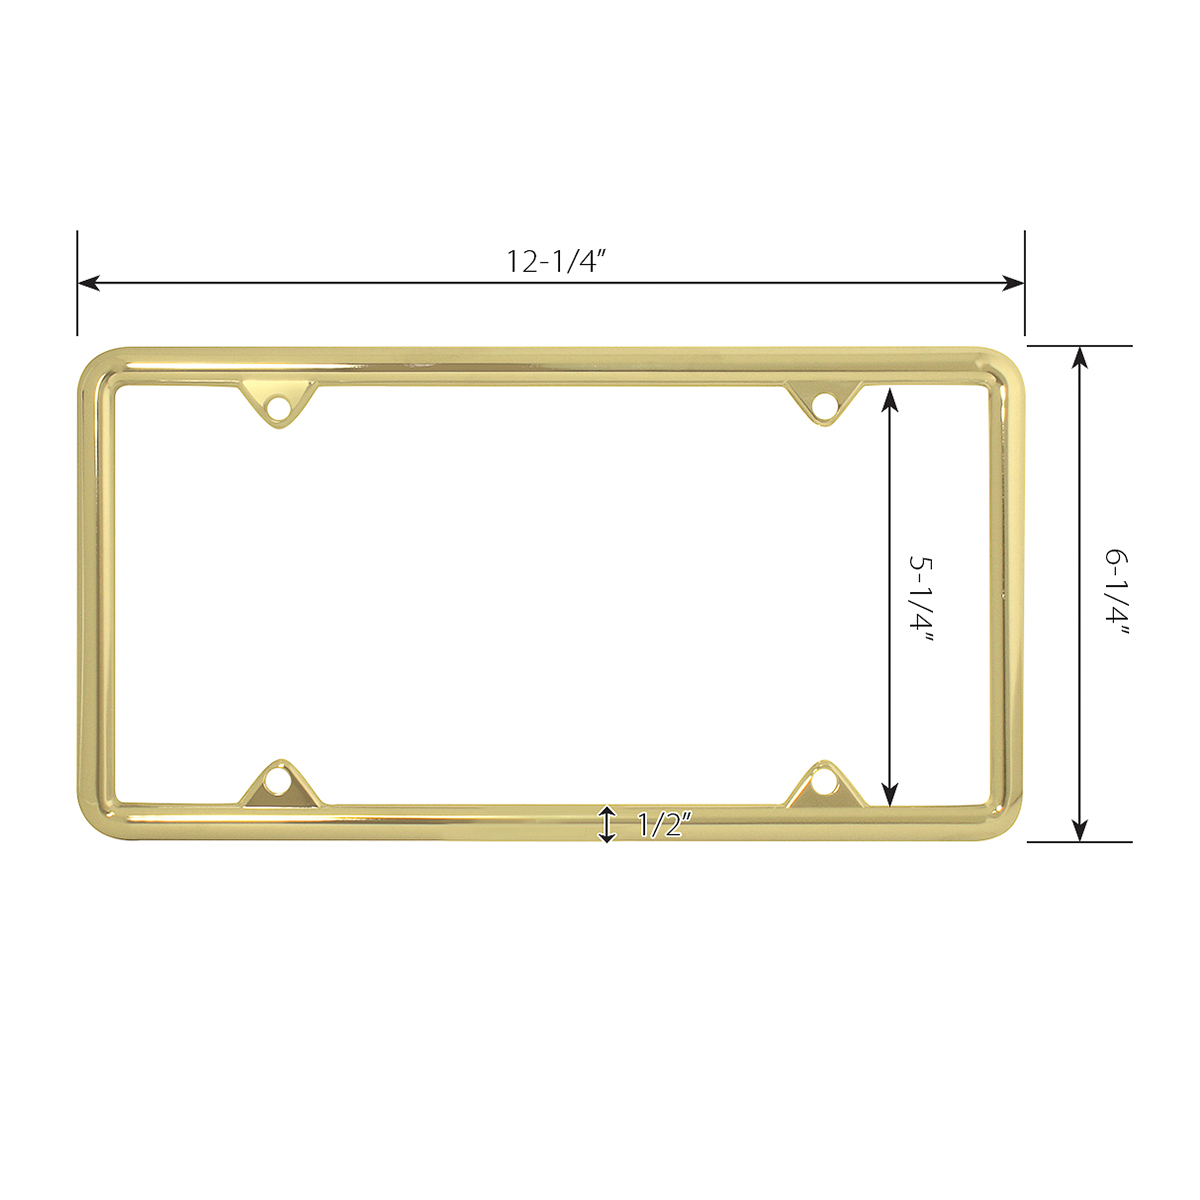 60062 Economic Brass-Plated Zinc Classic 4-Hole License Plate Frames - Measurements